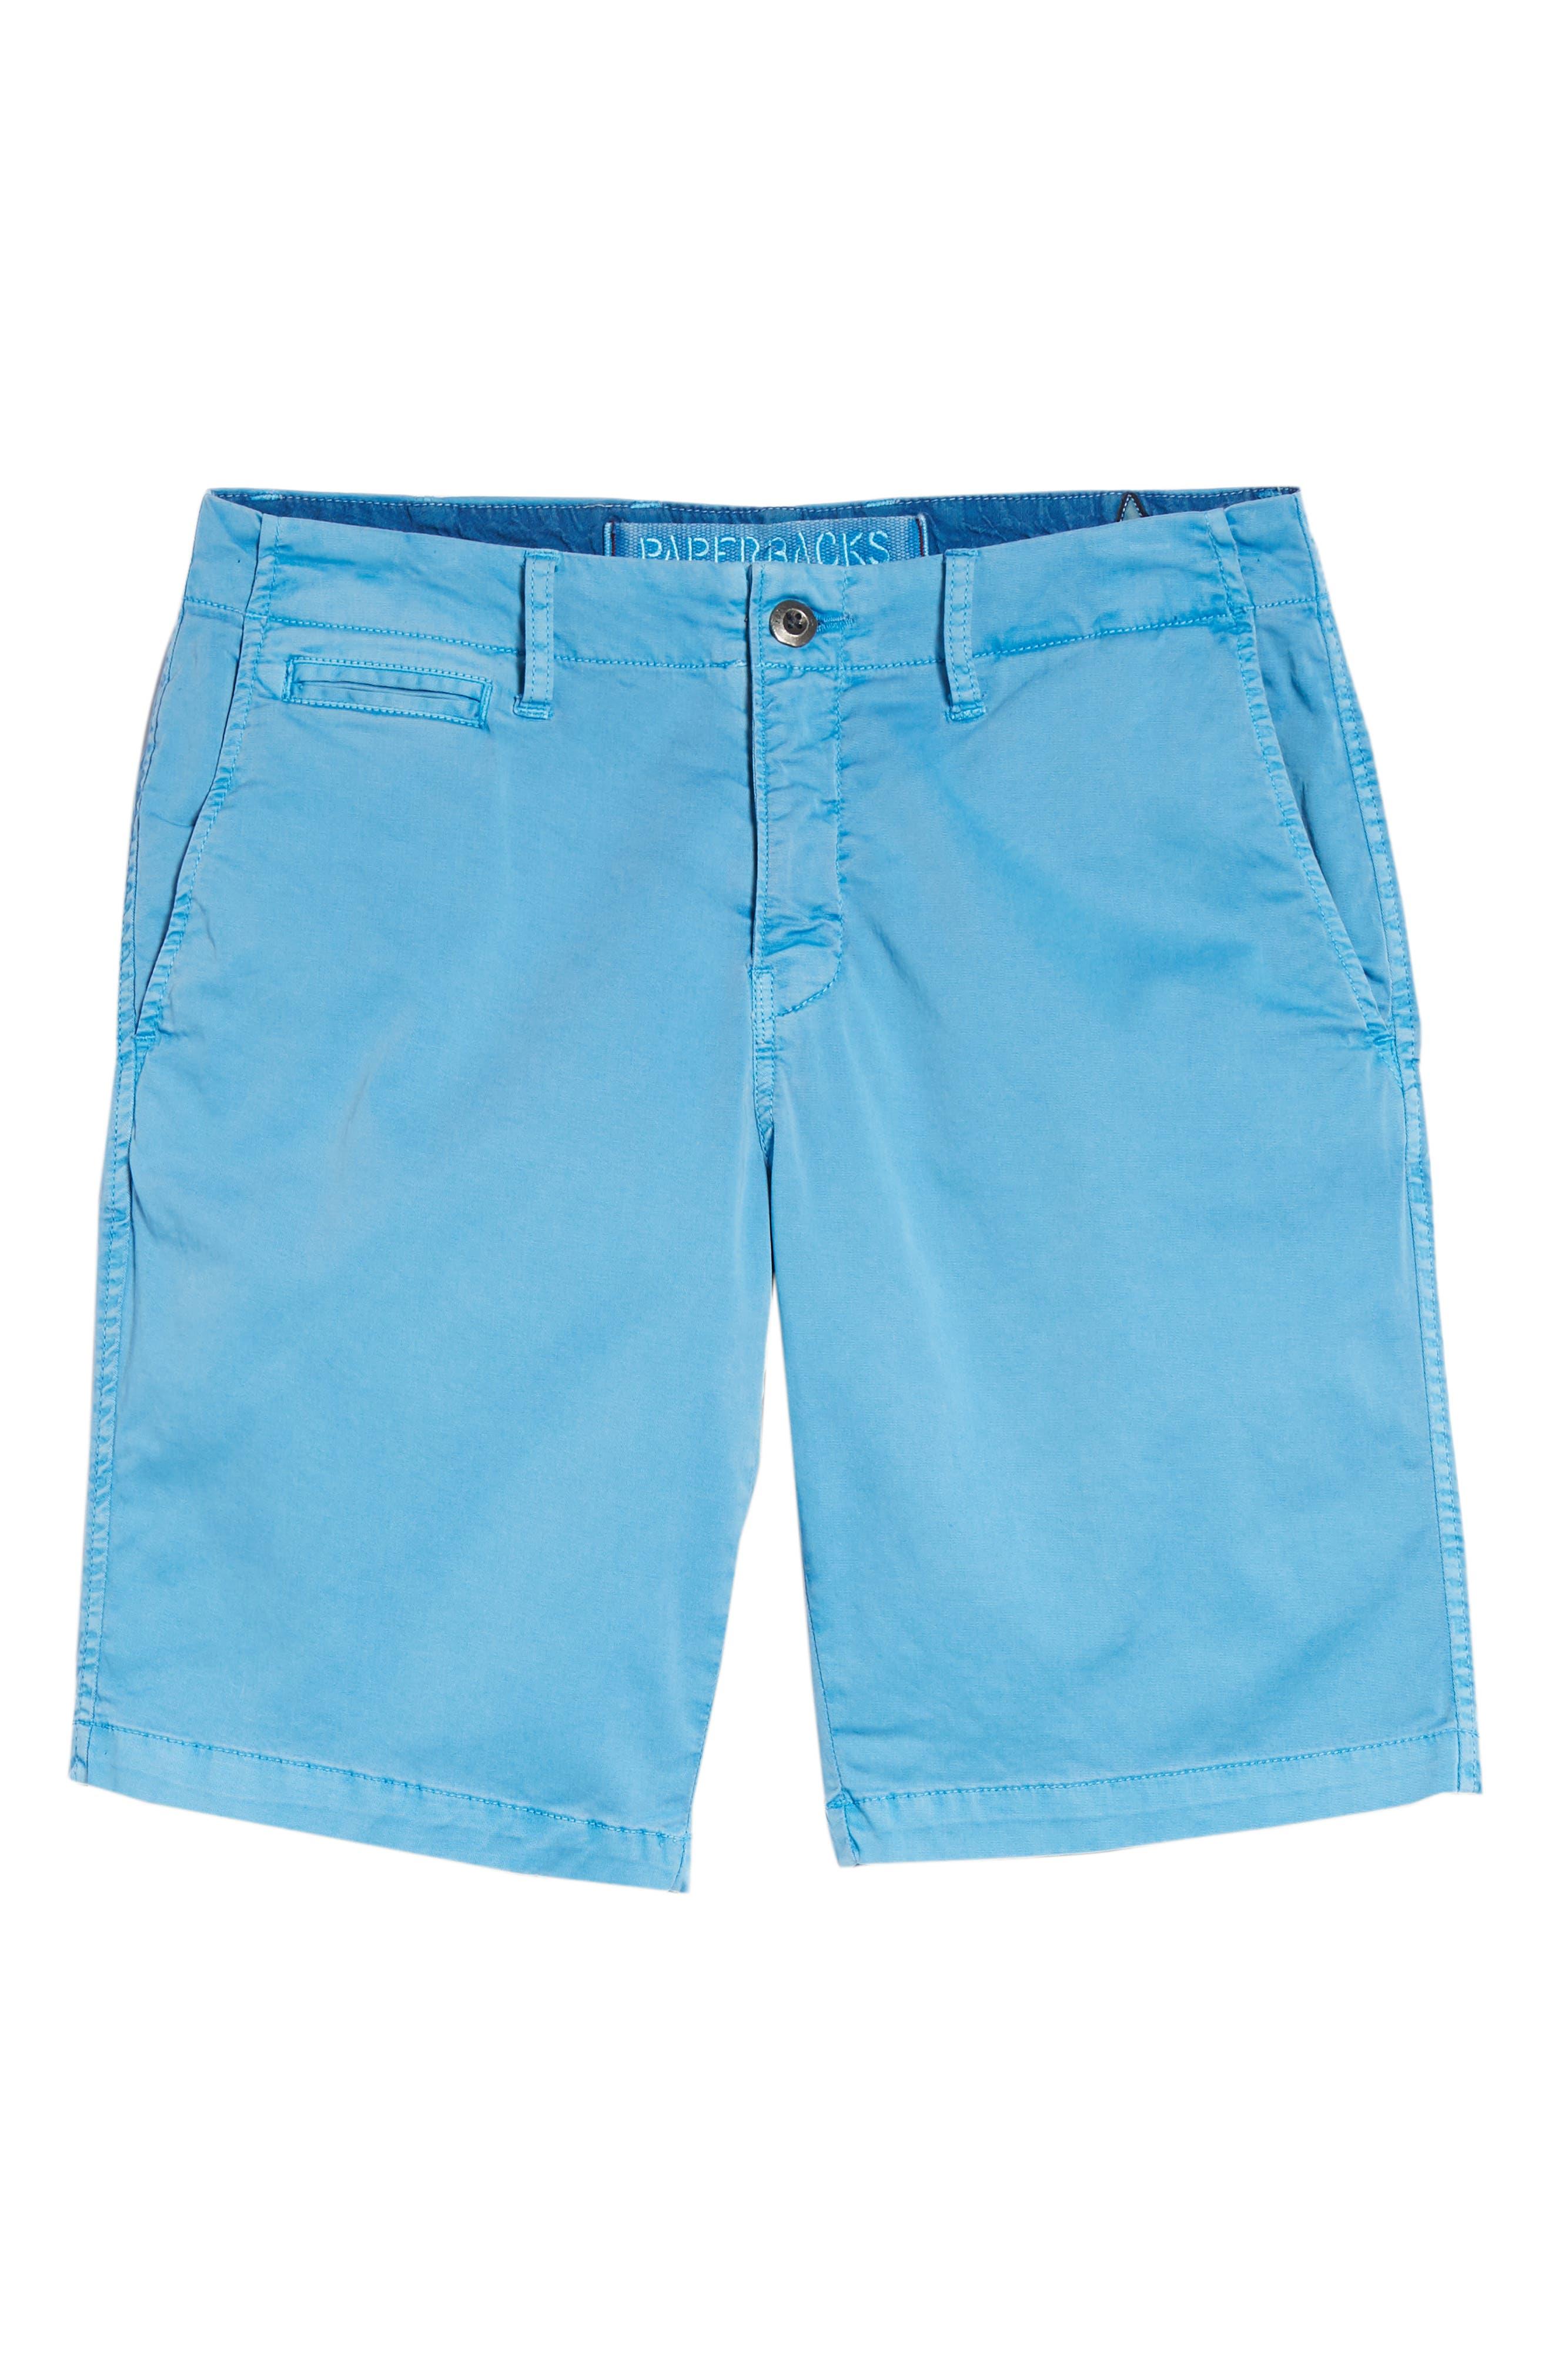 St. Barts Twill Shorts,                             Alternate thumbnail 68, color,